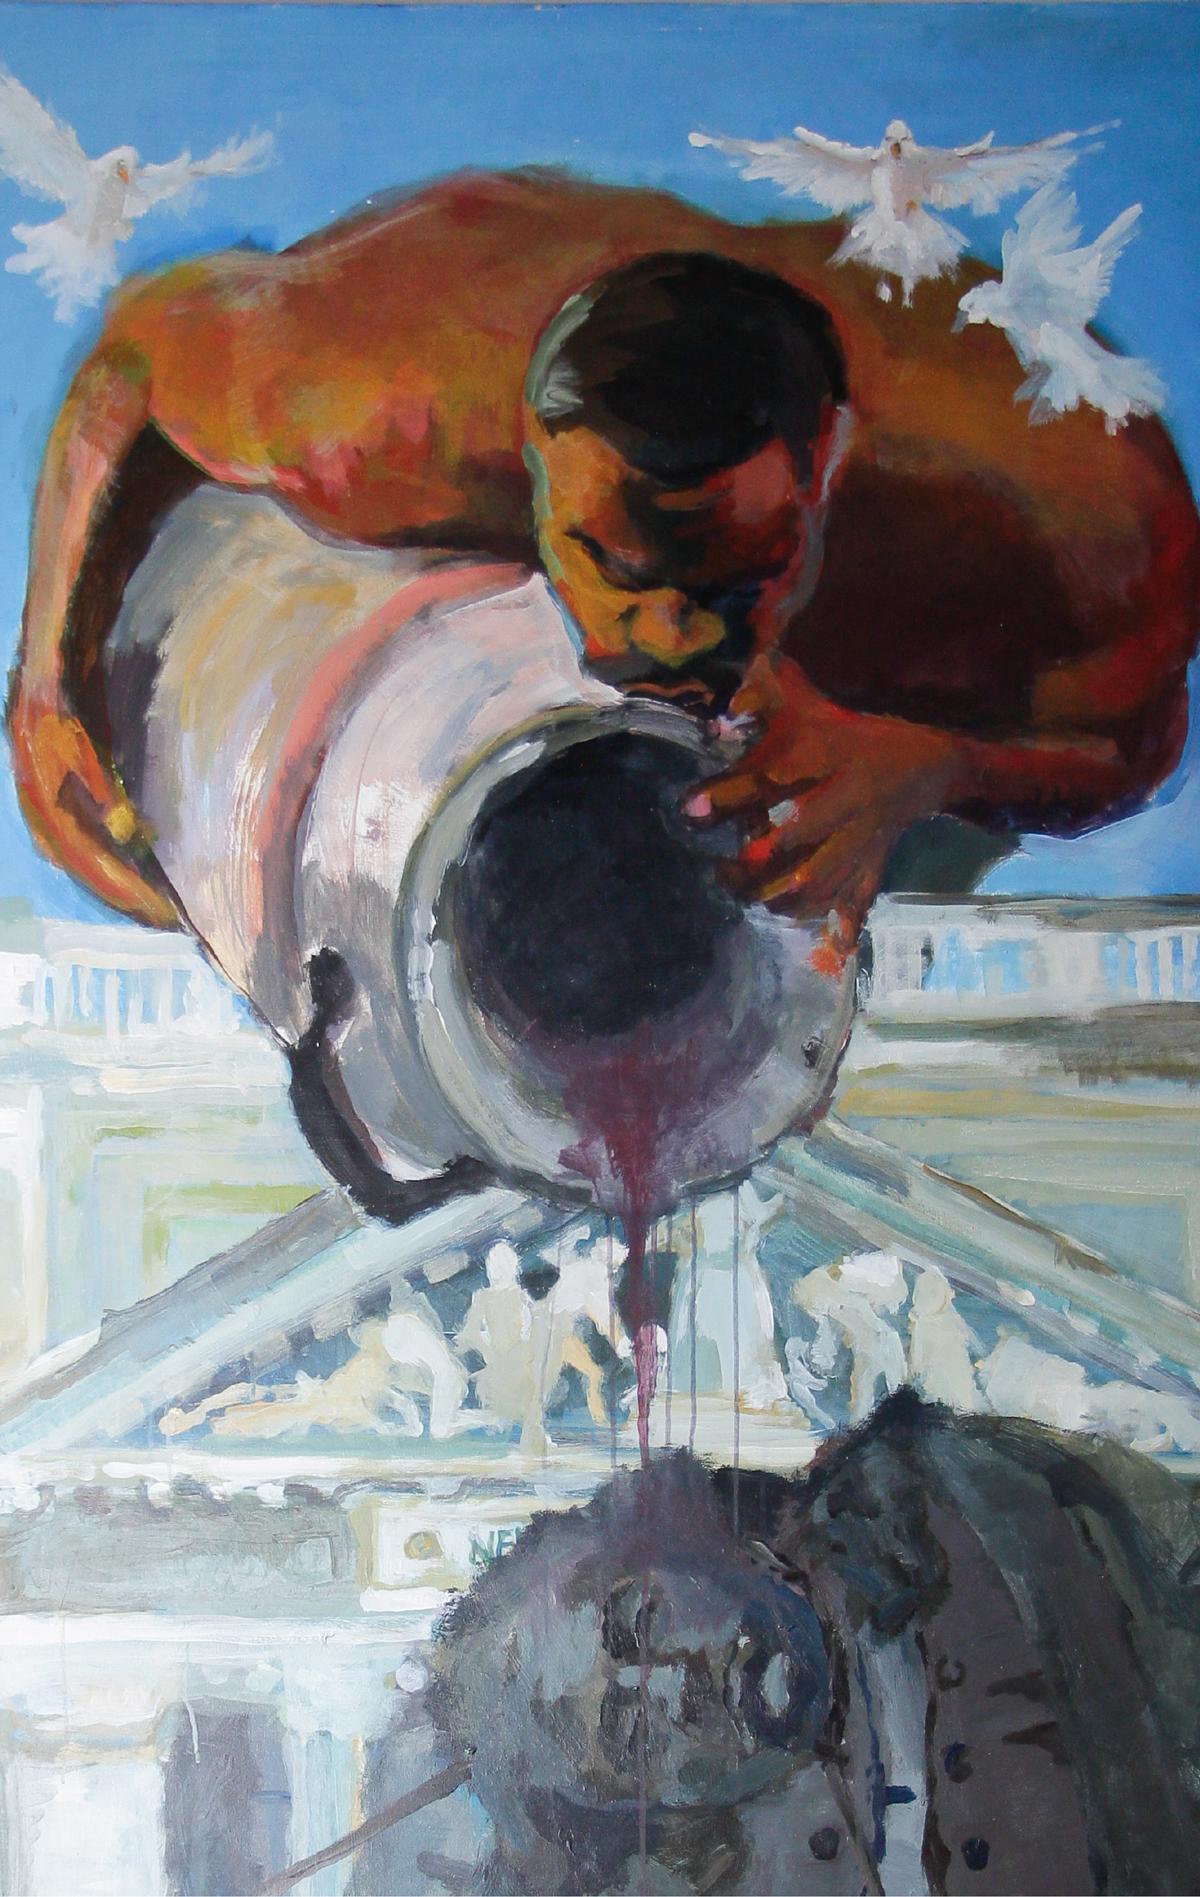 photograph of art student Emmanuel Oluwaseyi Bamtefa's painting